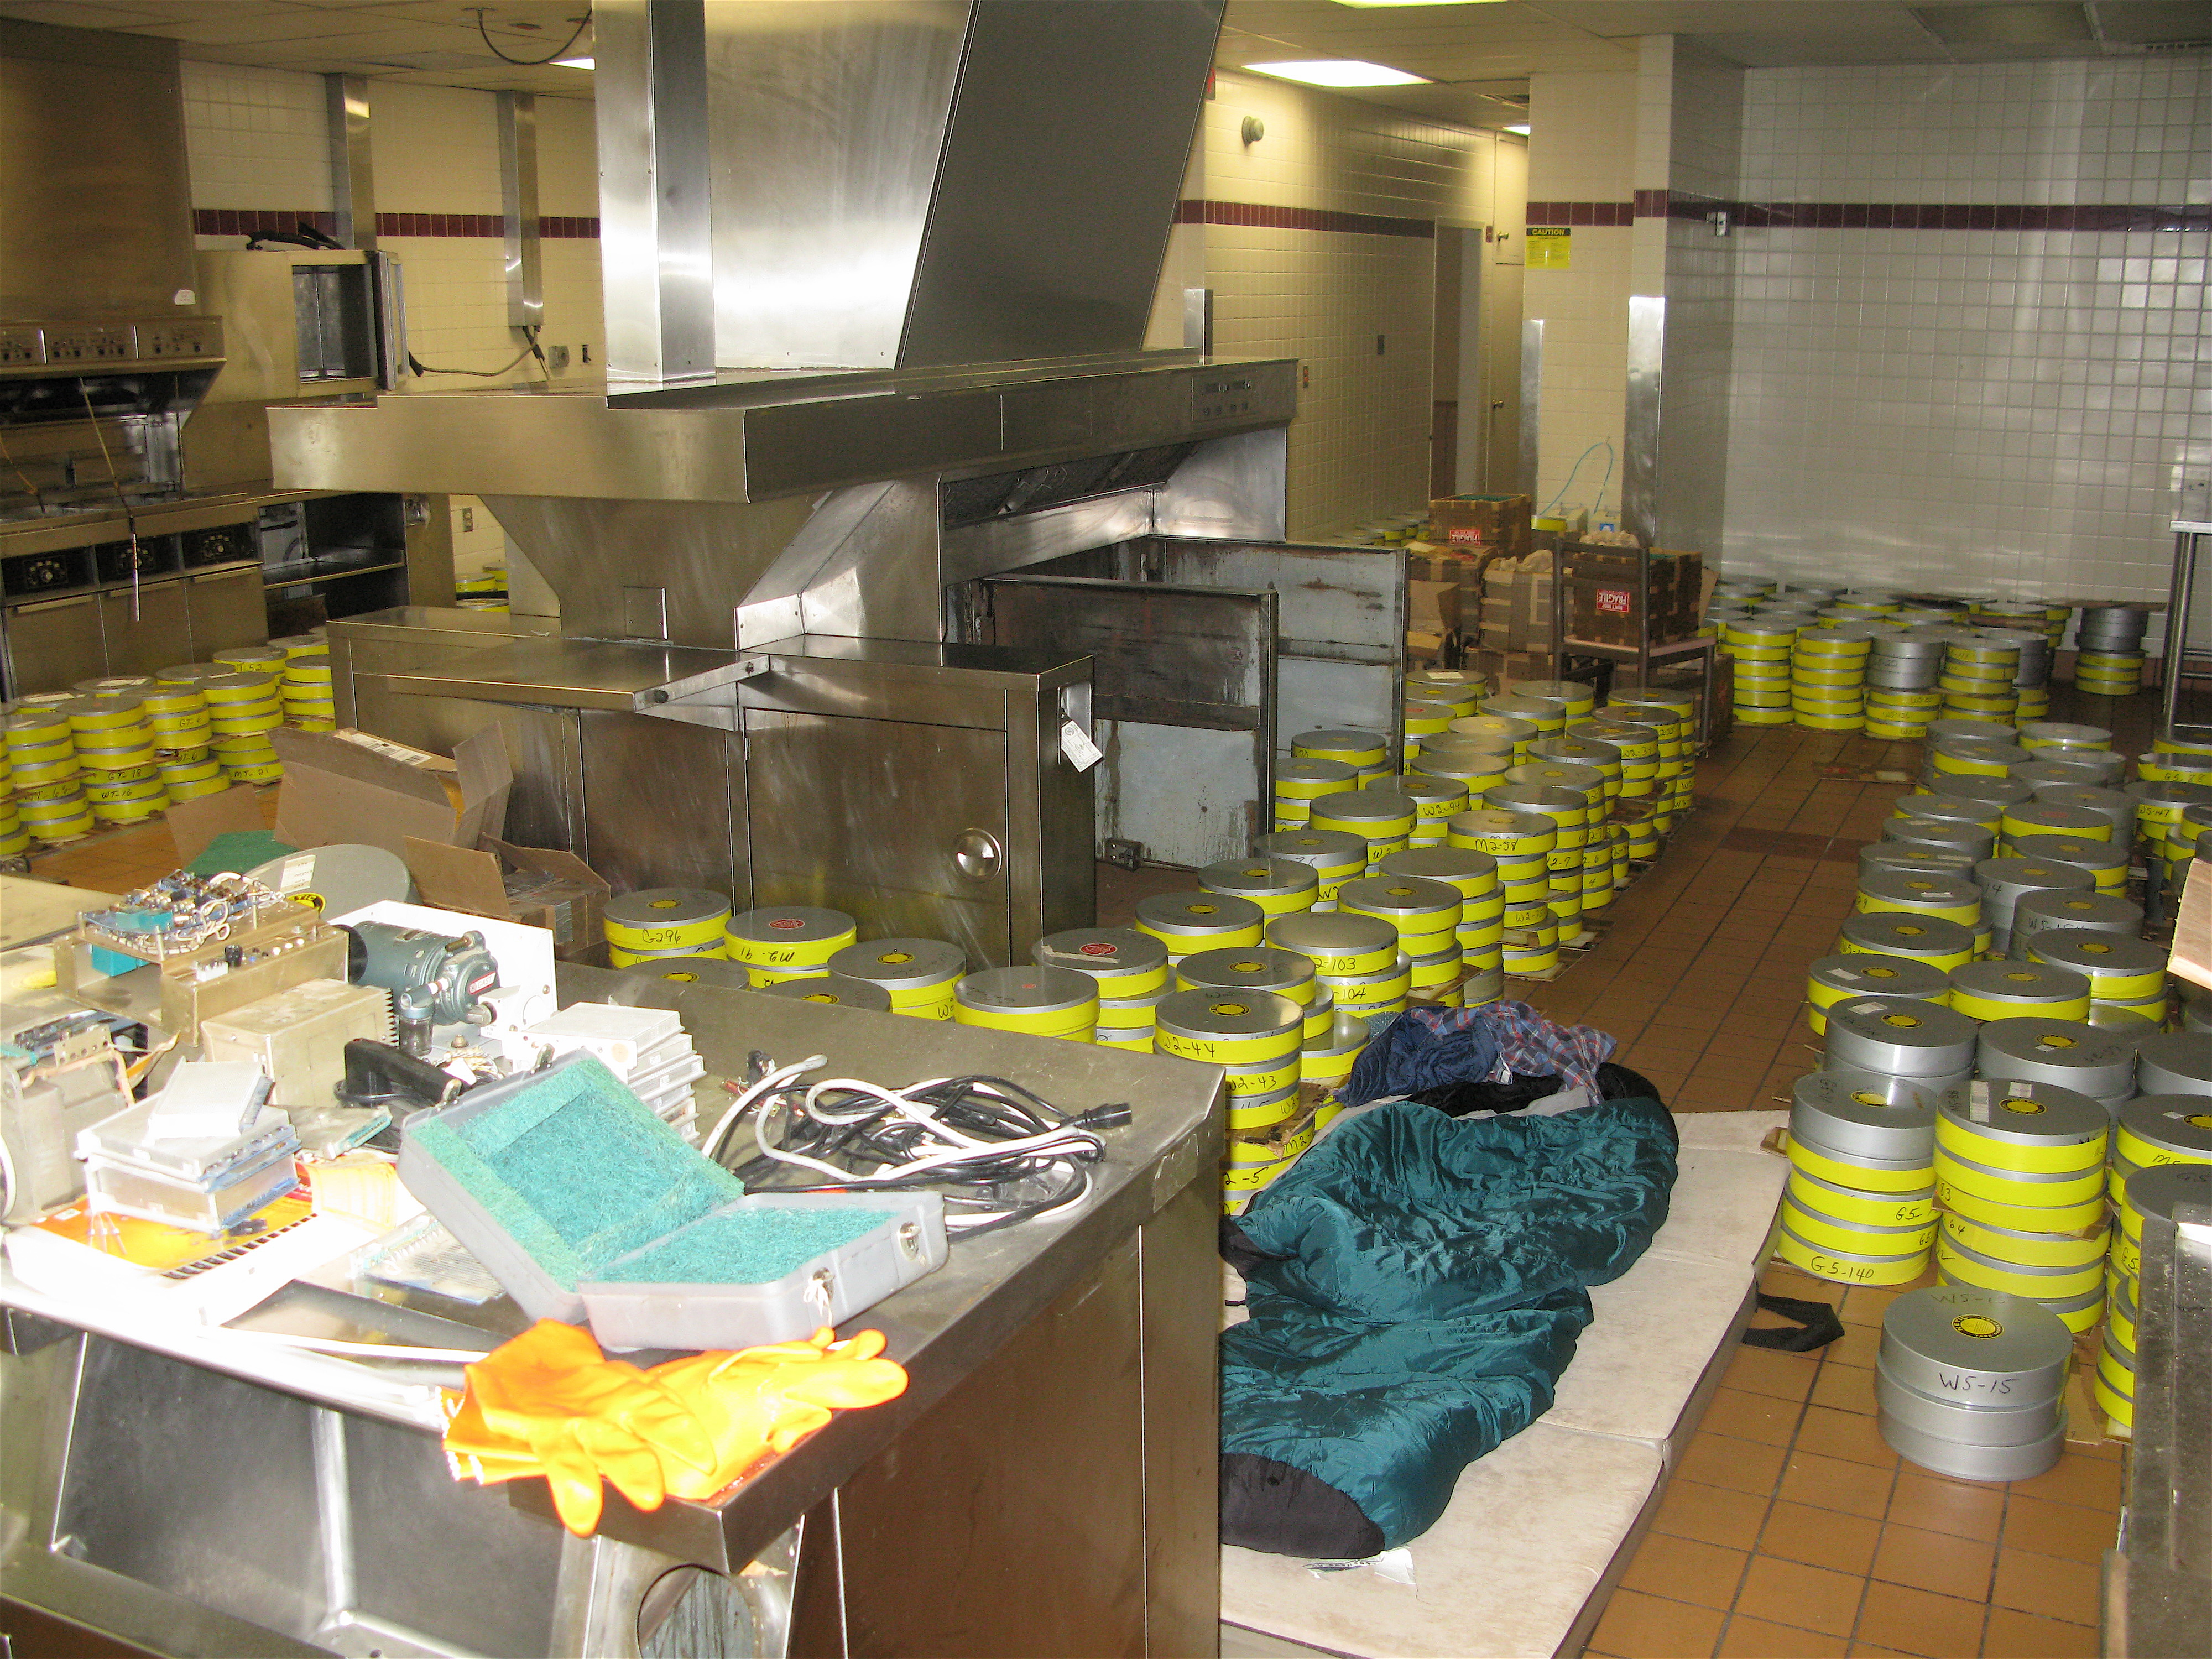 Katrina S Kitchen Menu